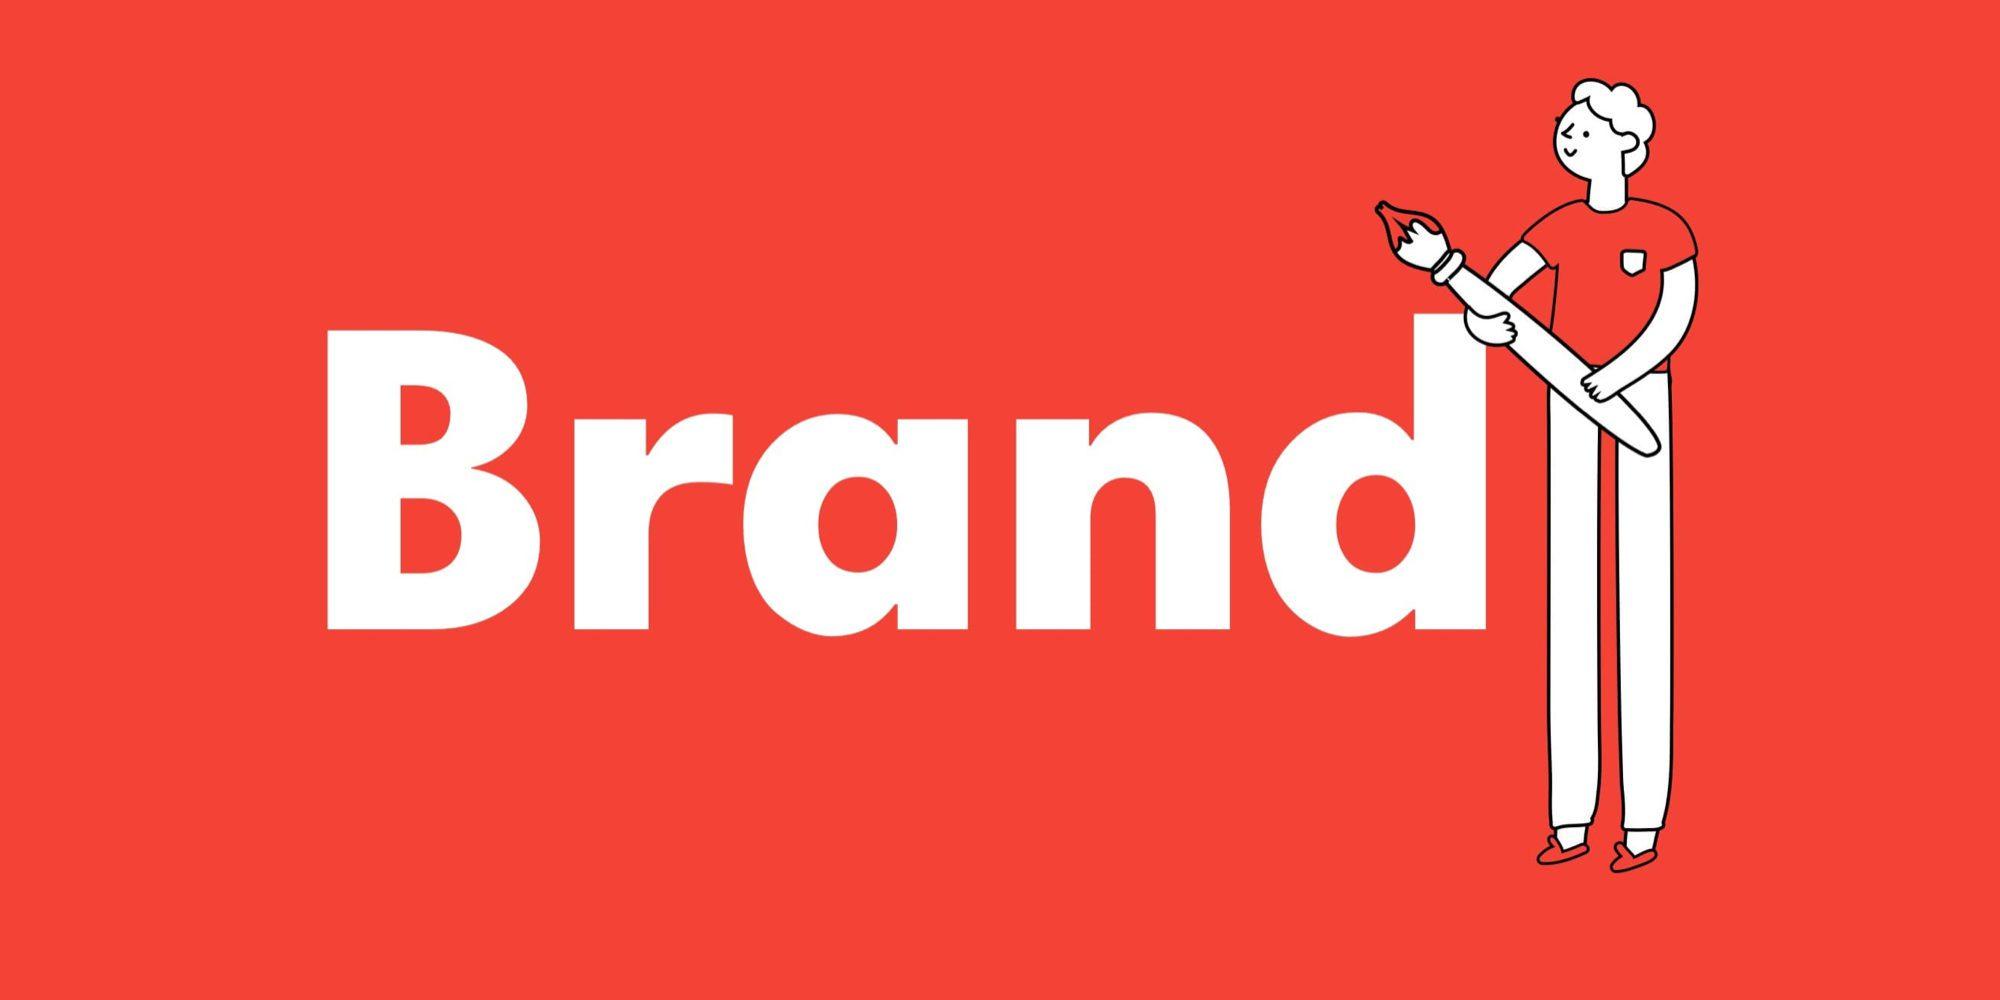 Northampton branding agency